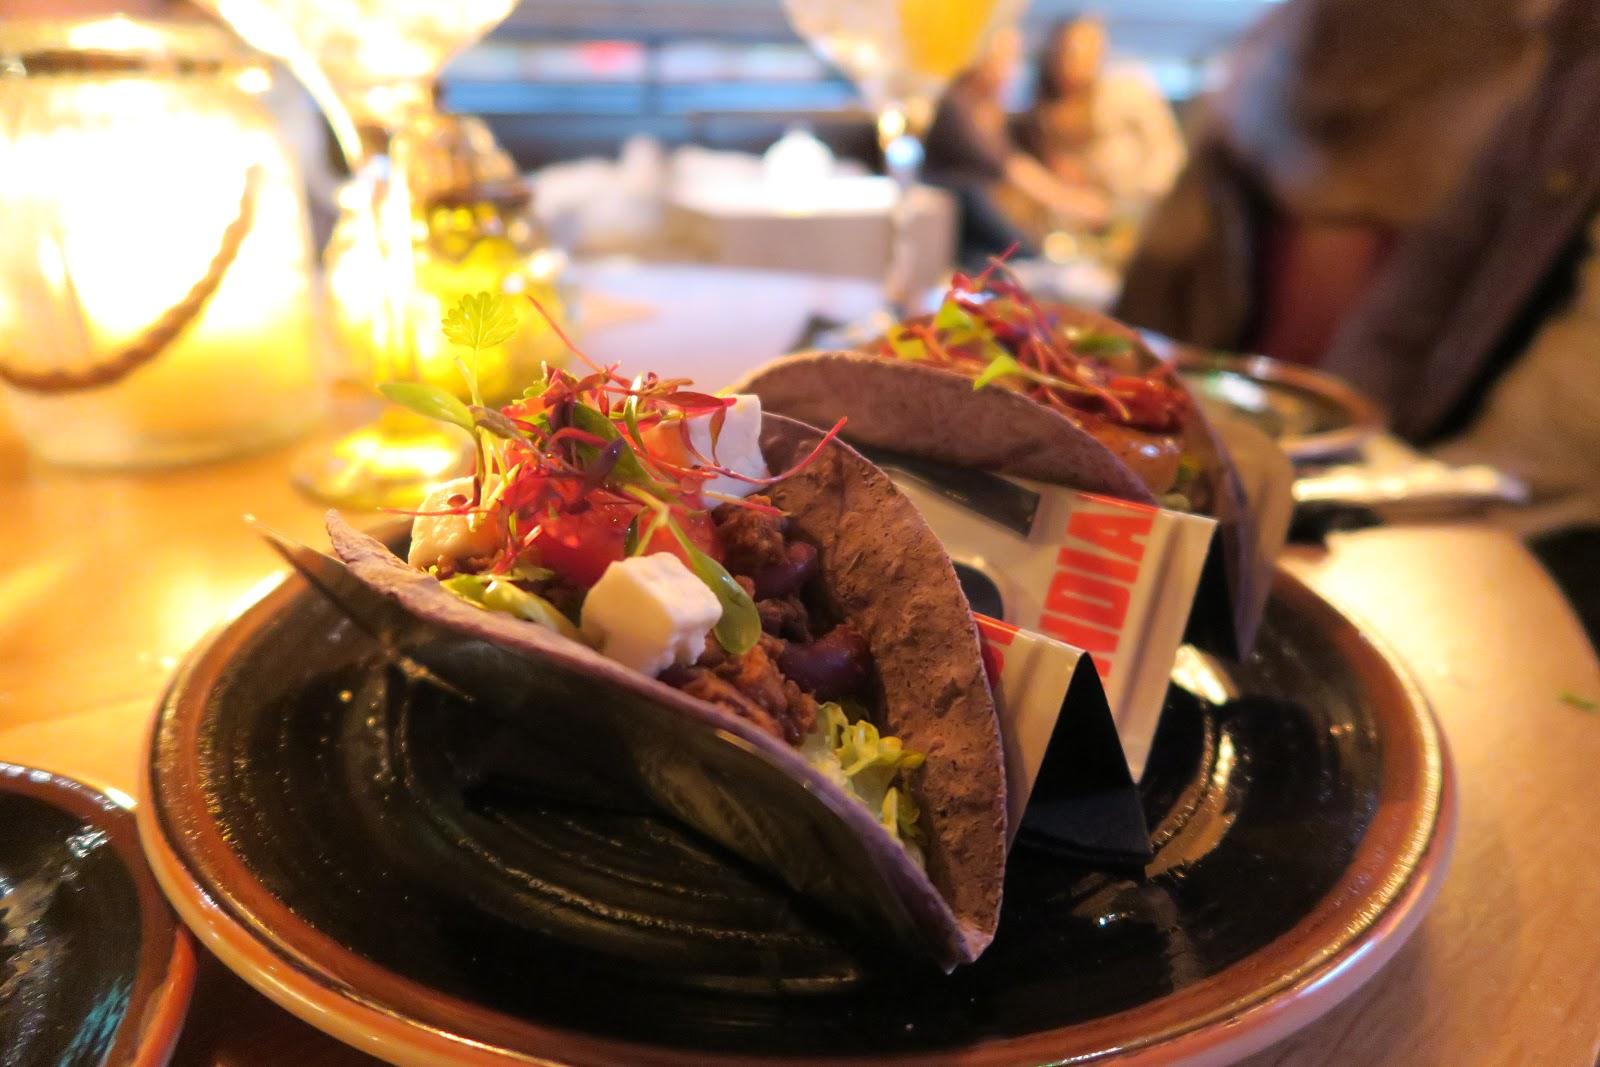 kangaroo tacos impossible bar manchester